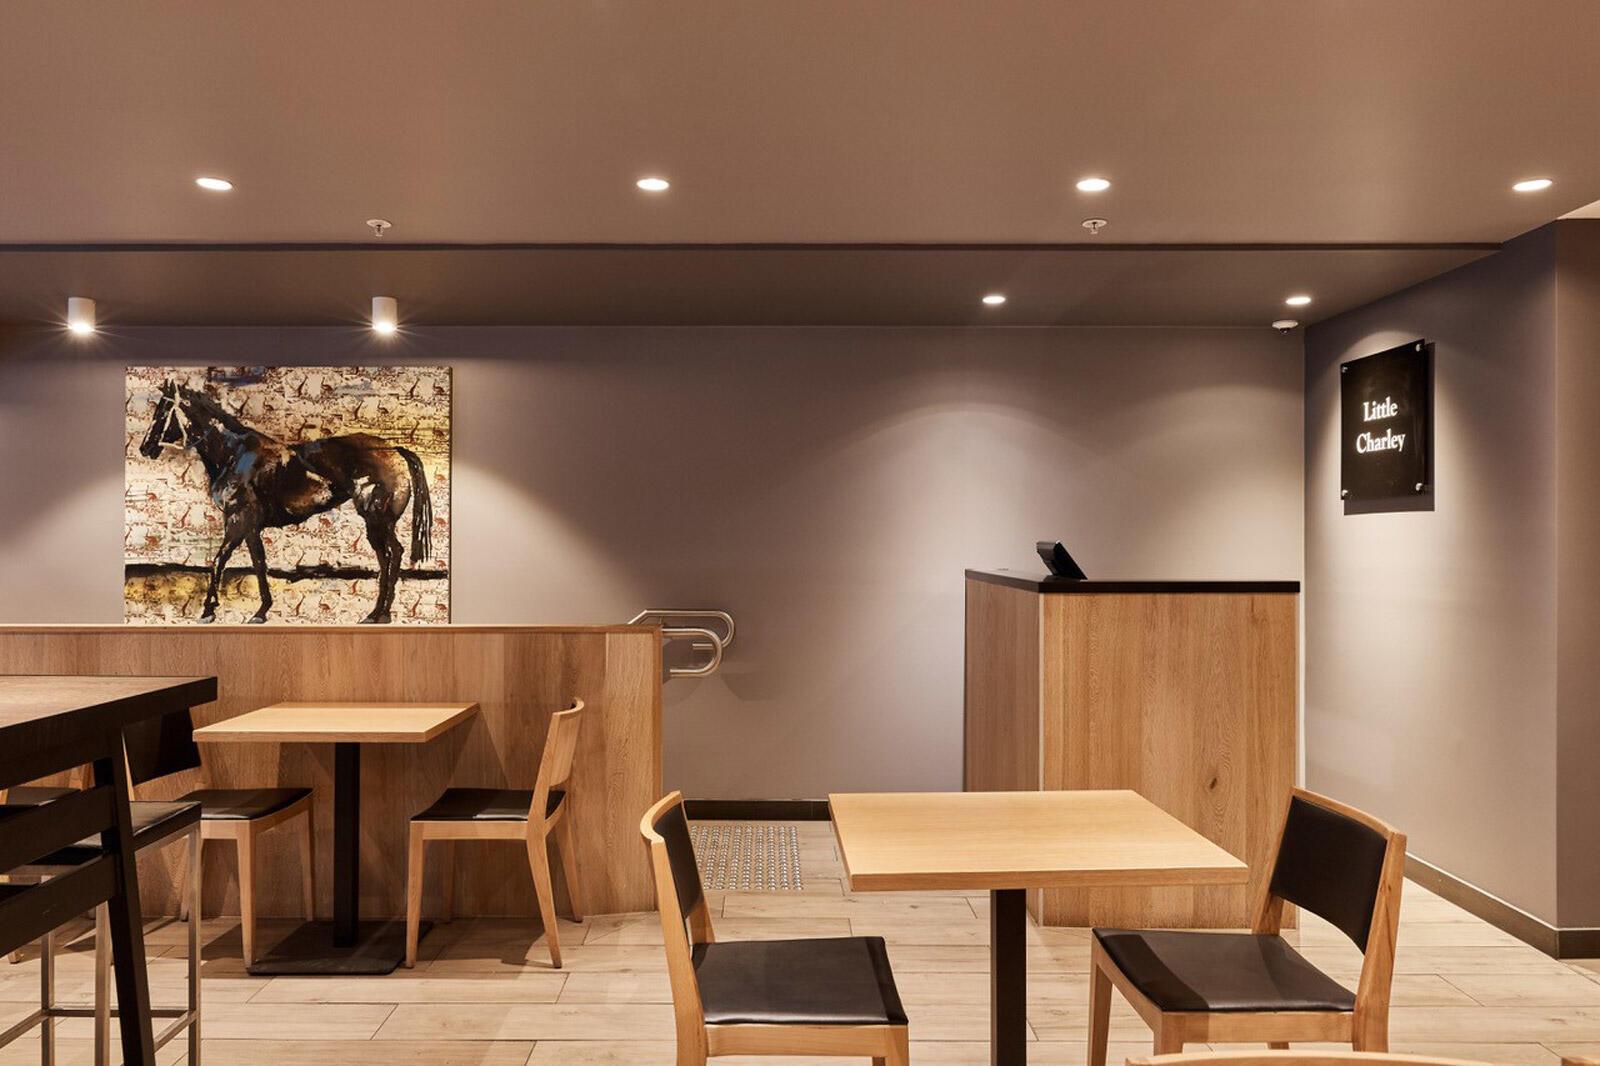 Café at Brady Hotel in central Melbourne